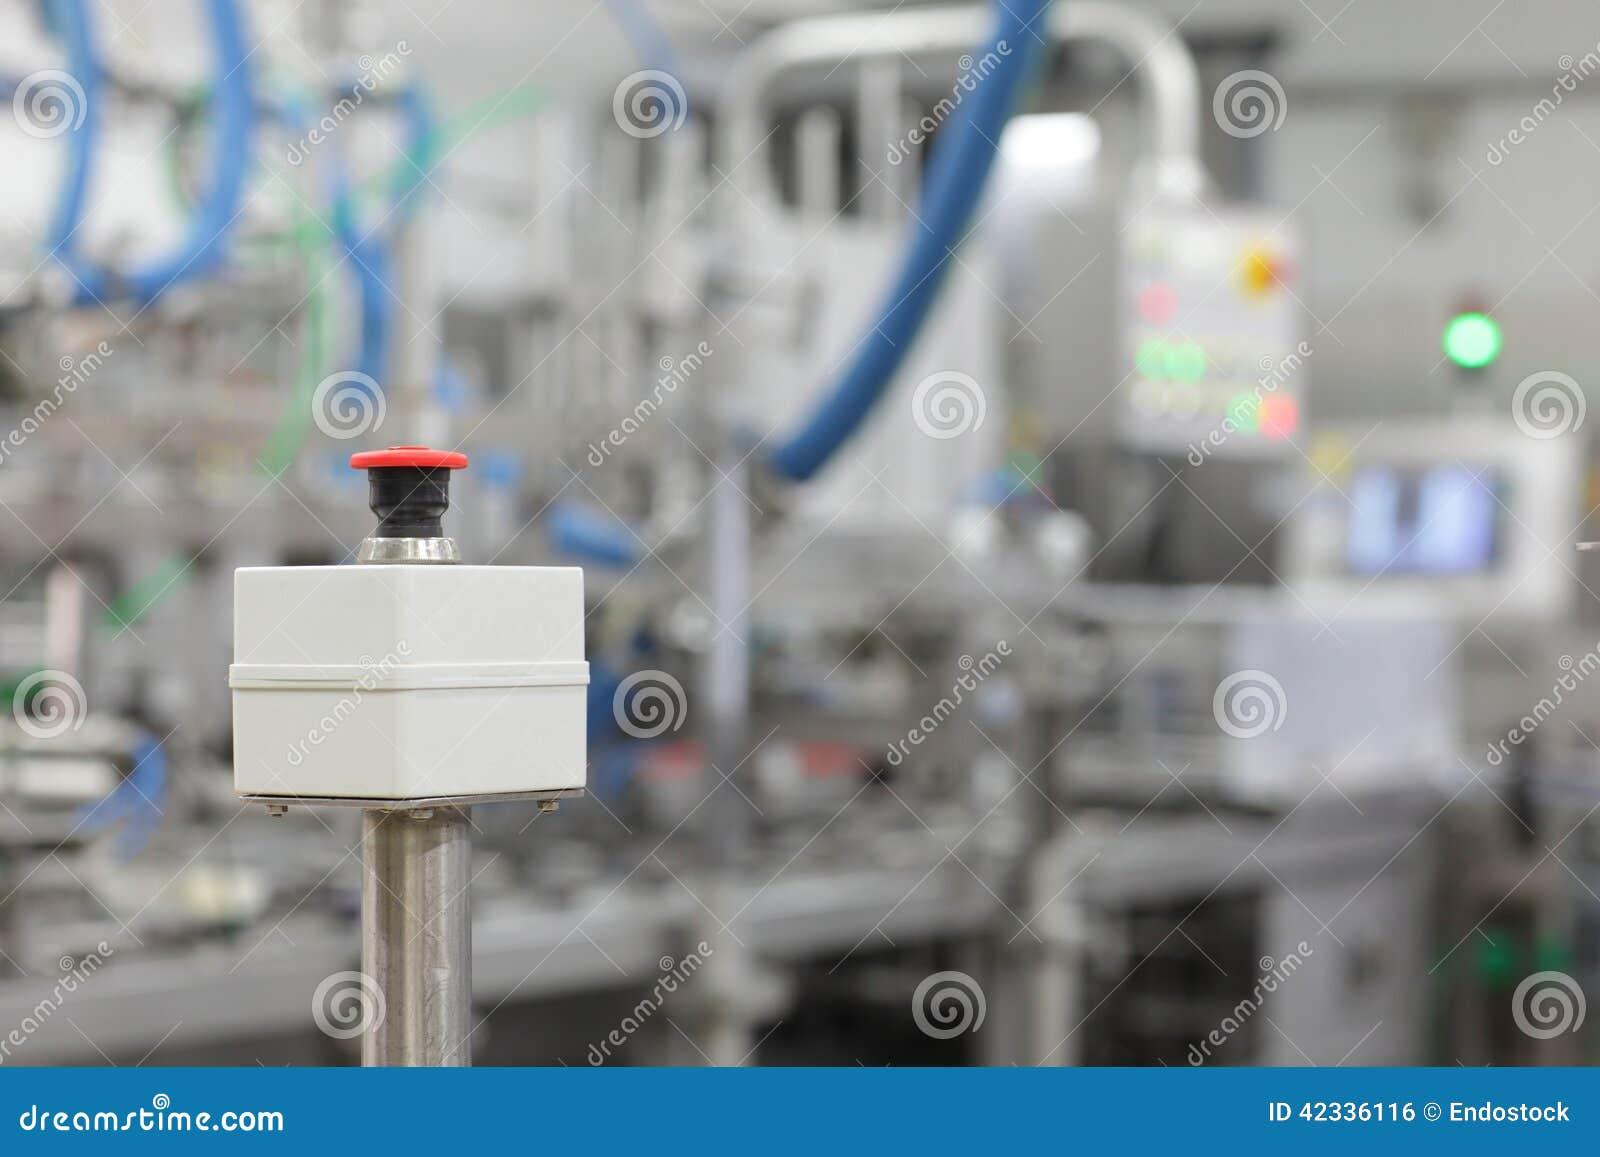 Botão start-stop no dispositivo industrial na planta